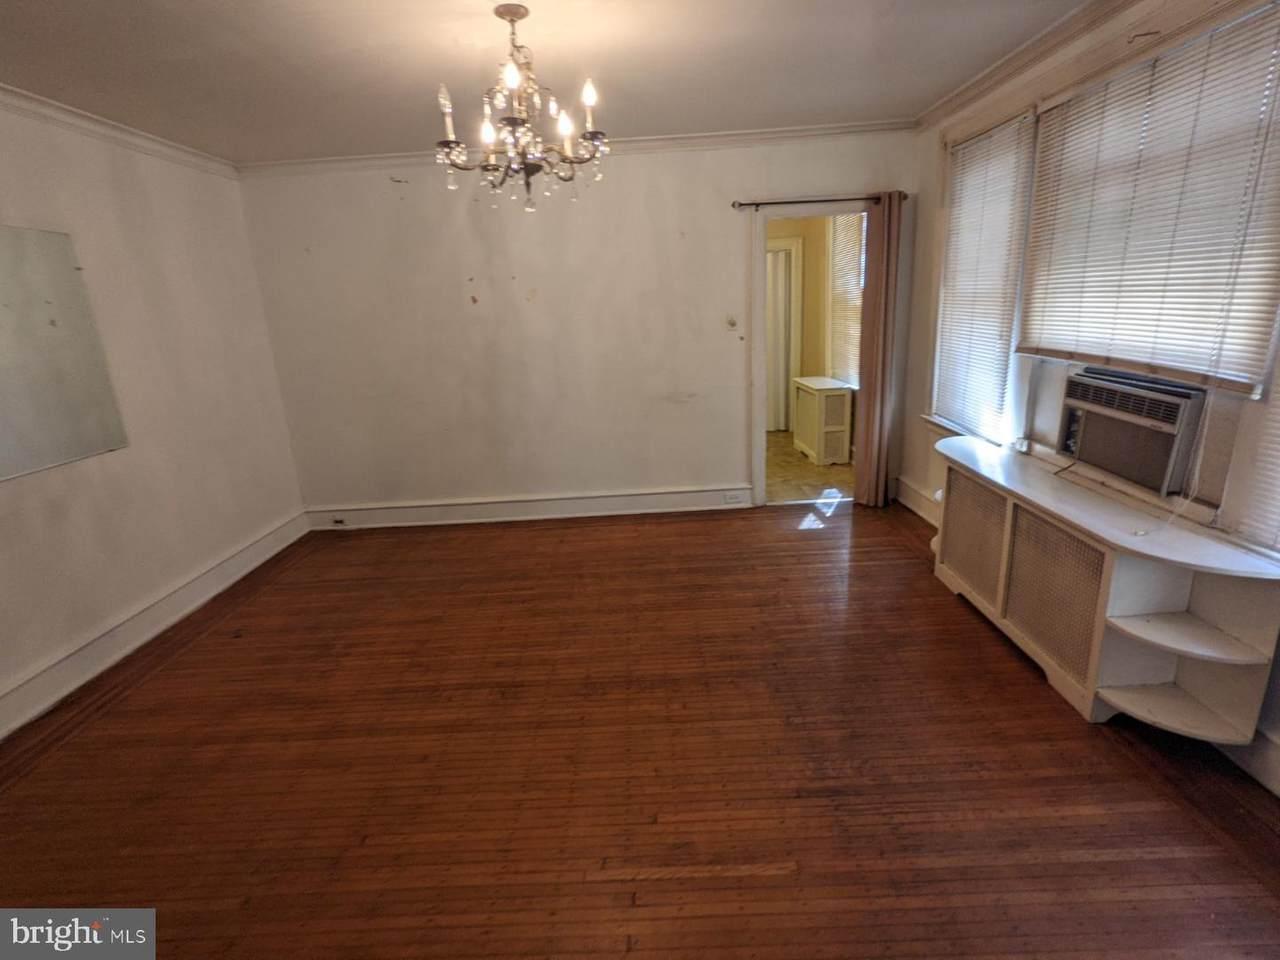 6040 Carpenter Street - Photo 1